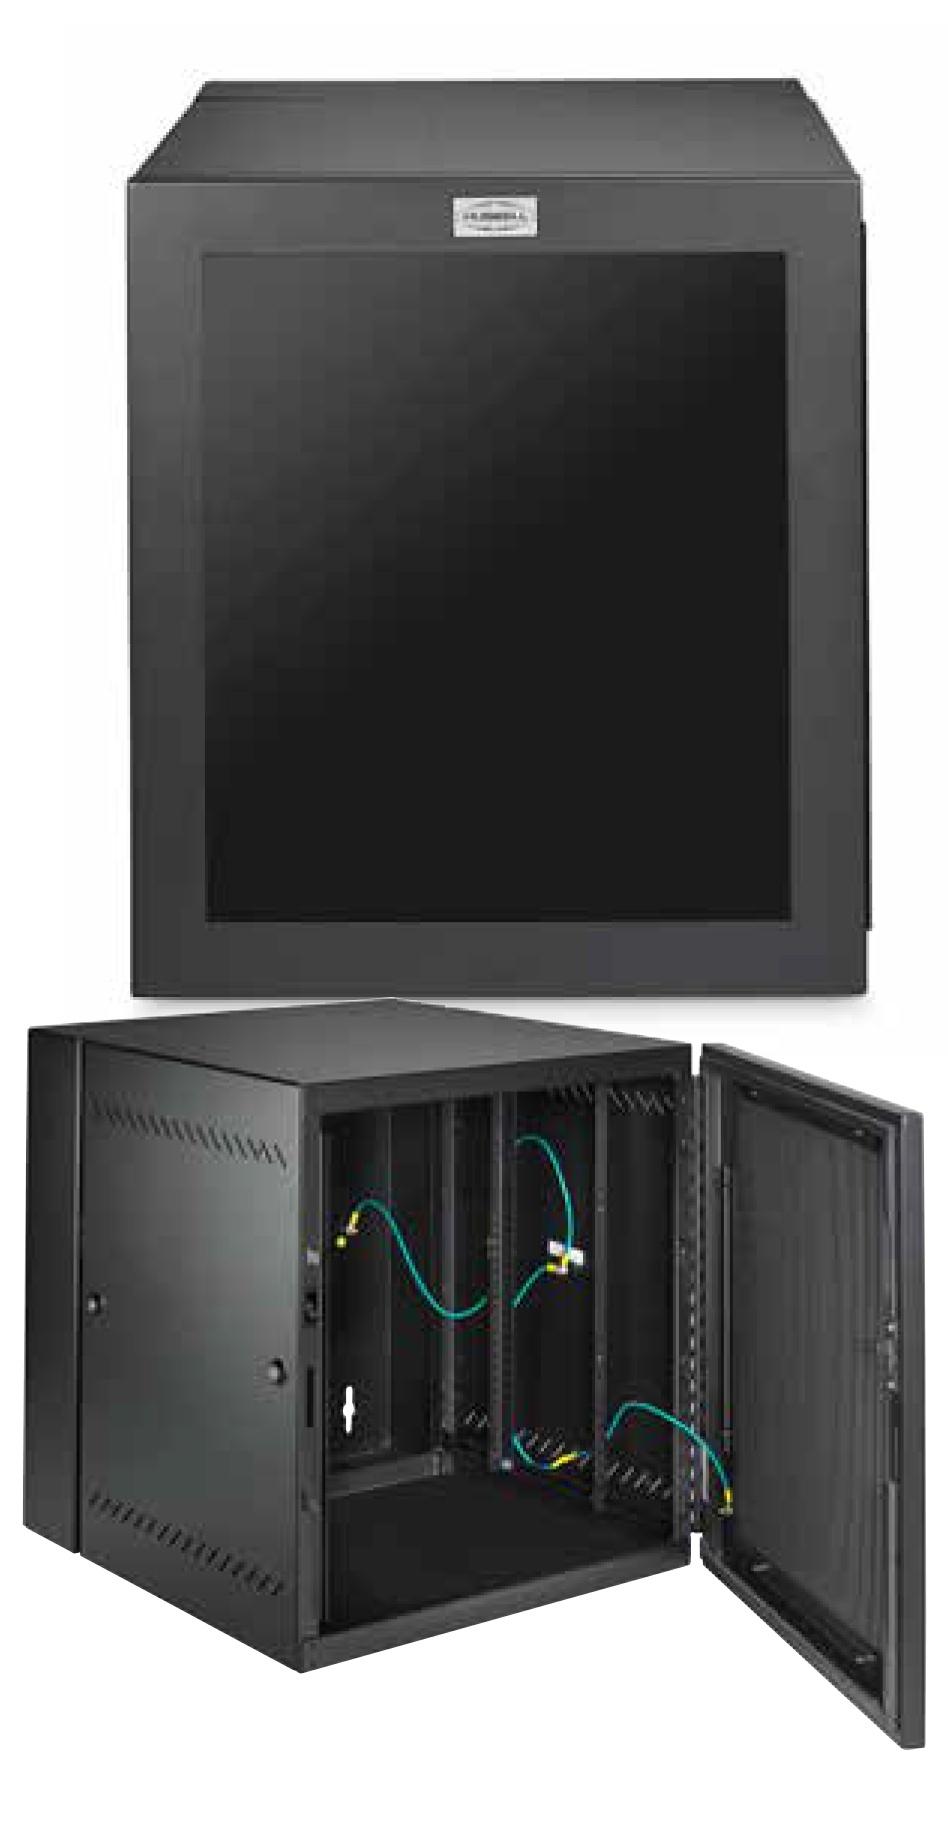 HLQ-Wall-Mount-Cabinets.jpg